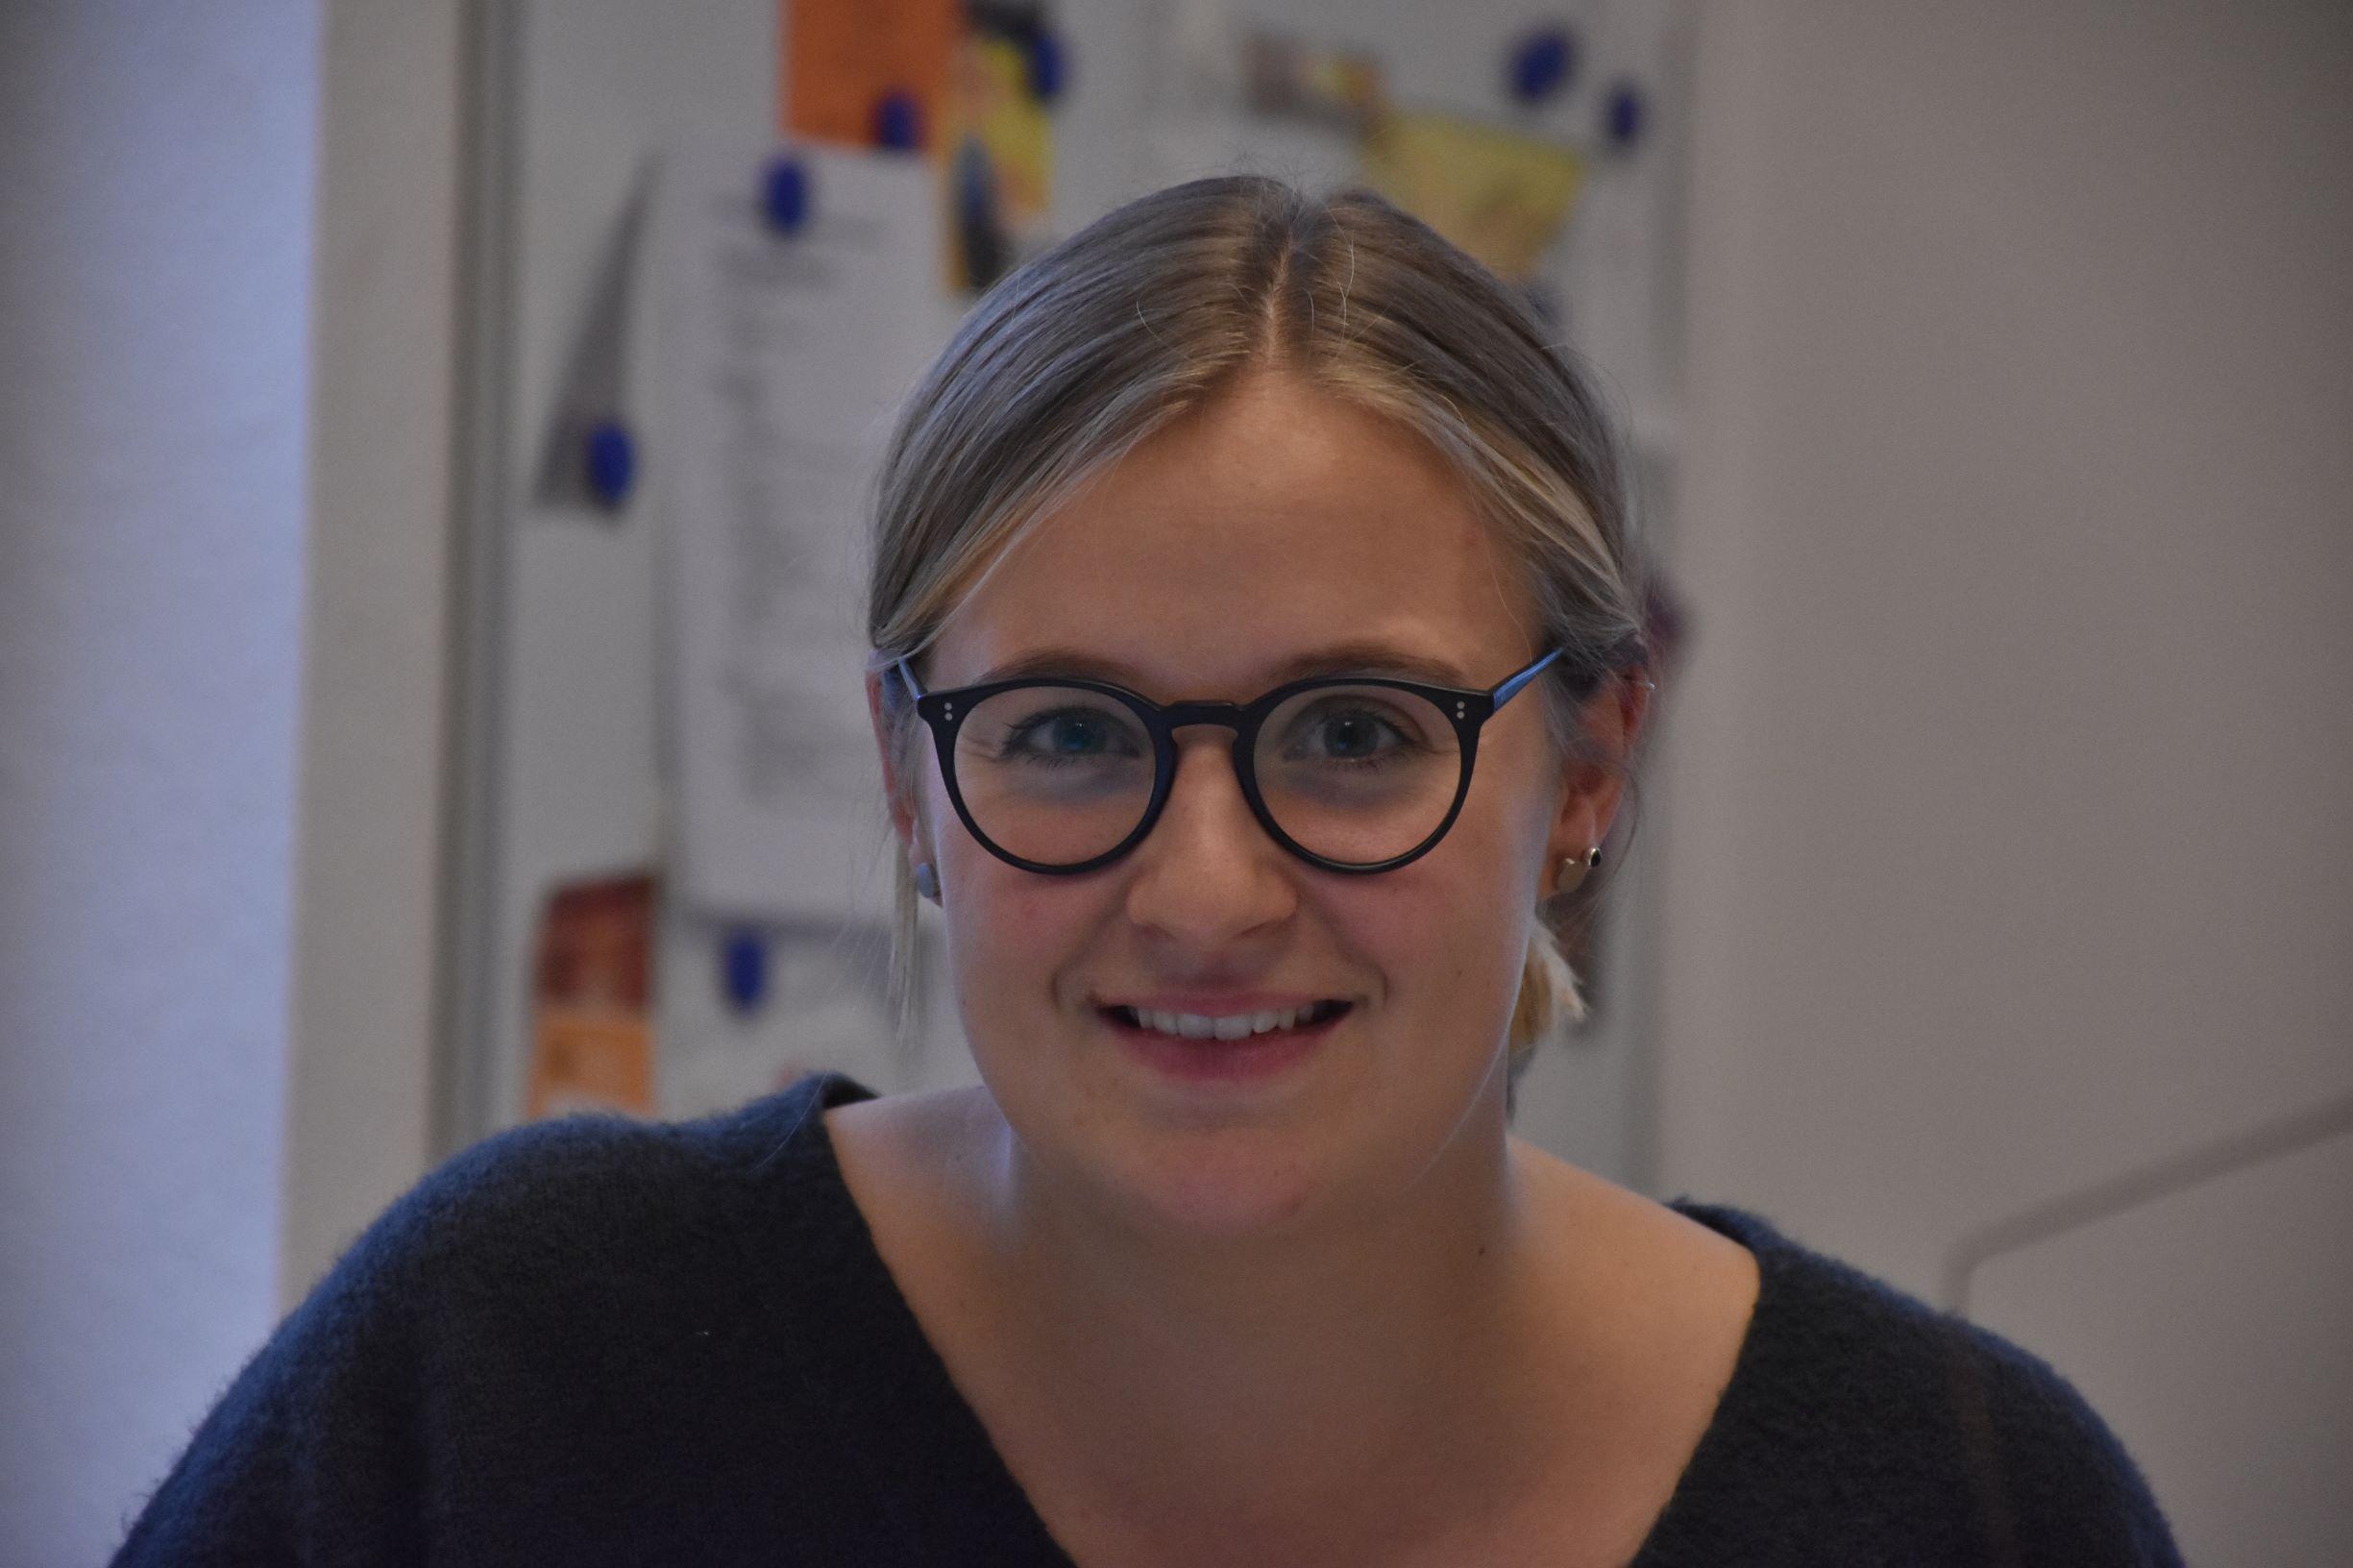 Leona Effertz